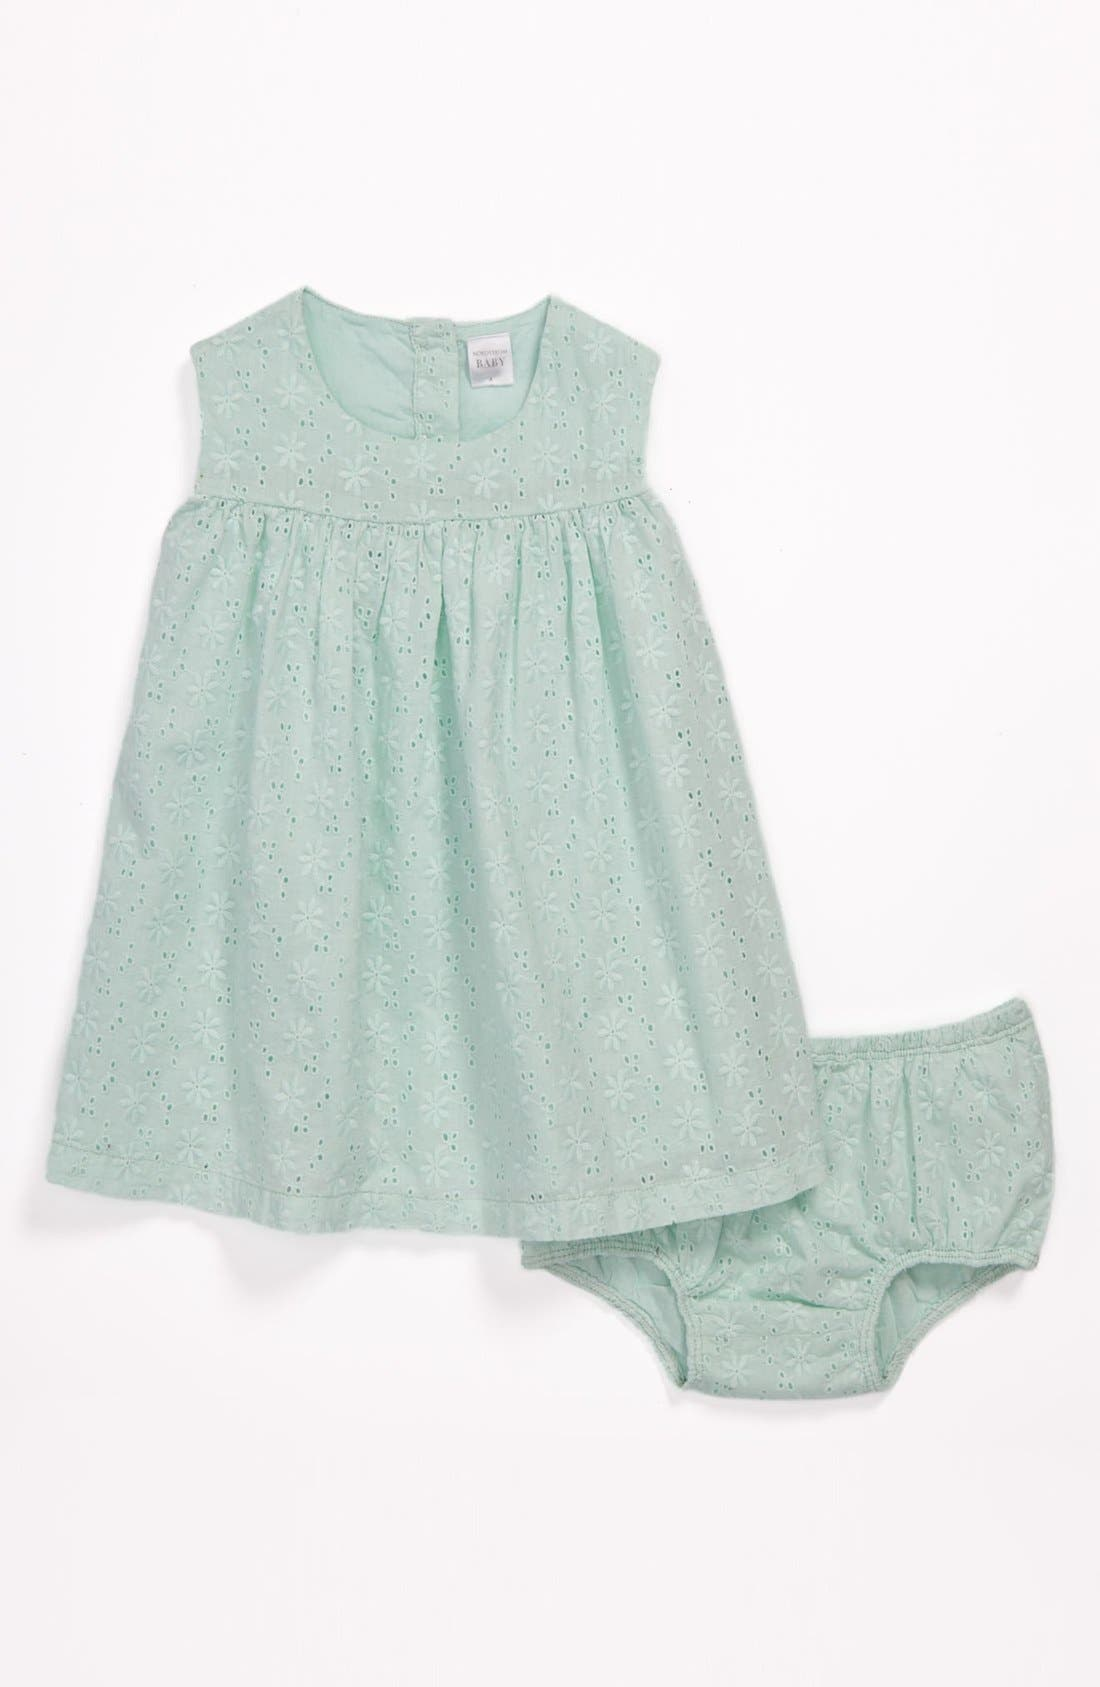 Alternate Image 1 Selected - Nordstrom Baby Eyelet Dress & Bloomers (Baby Girls)